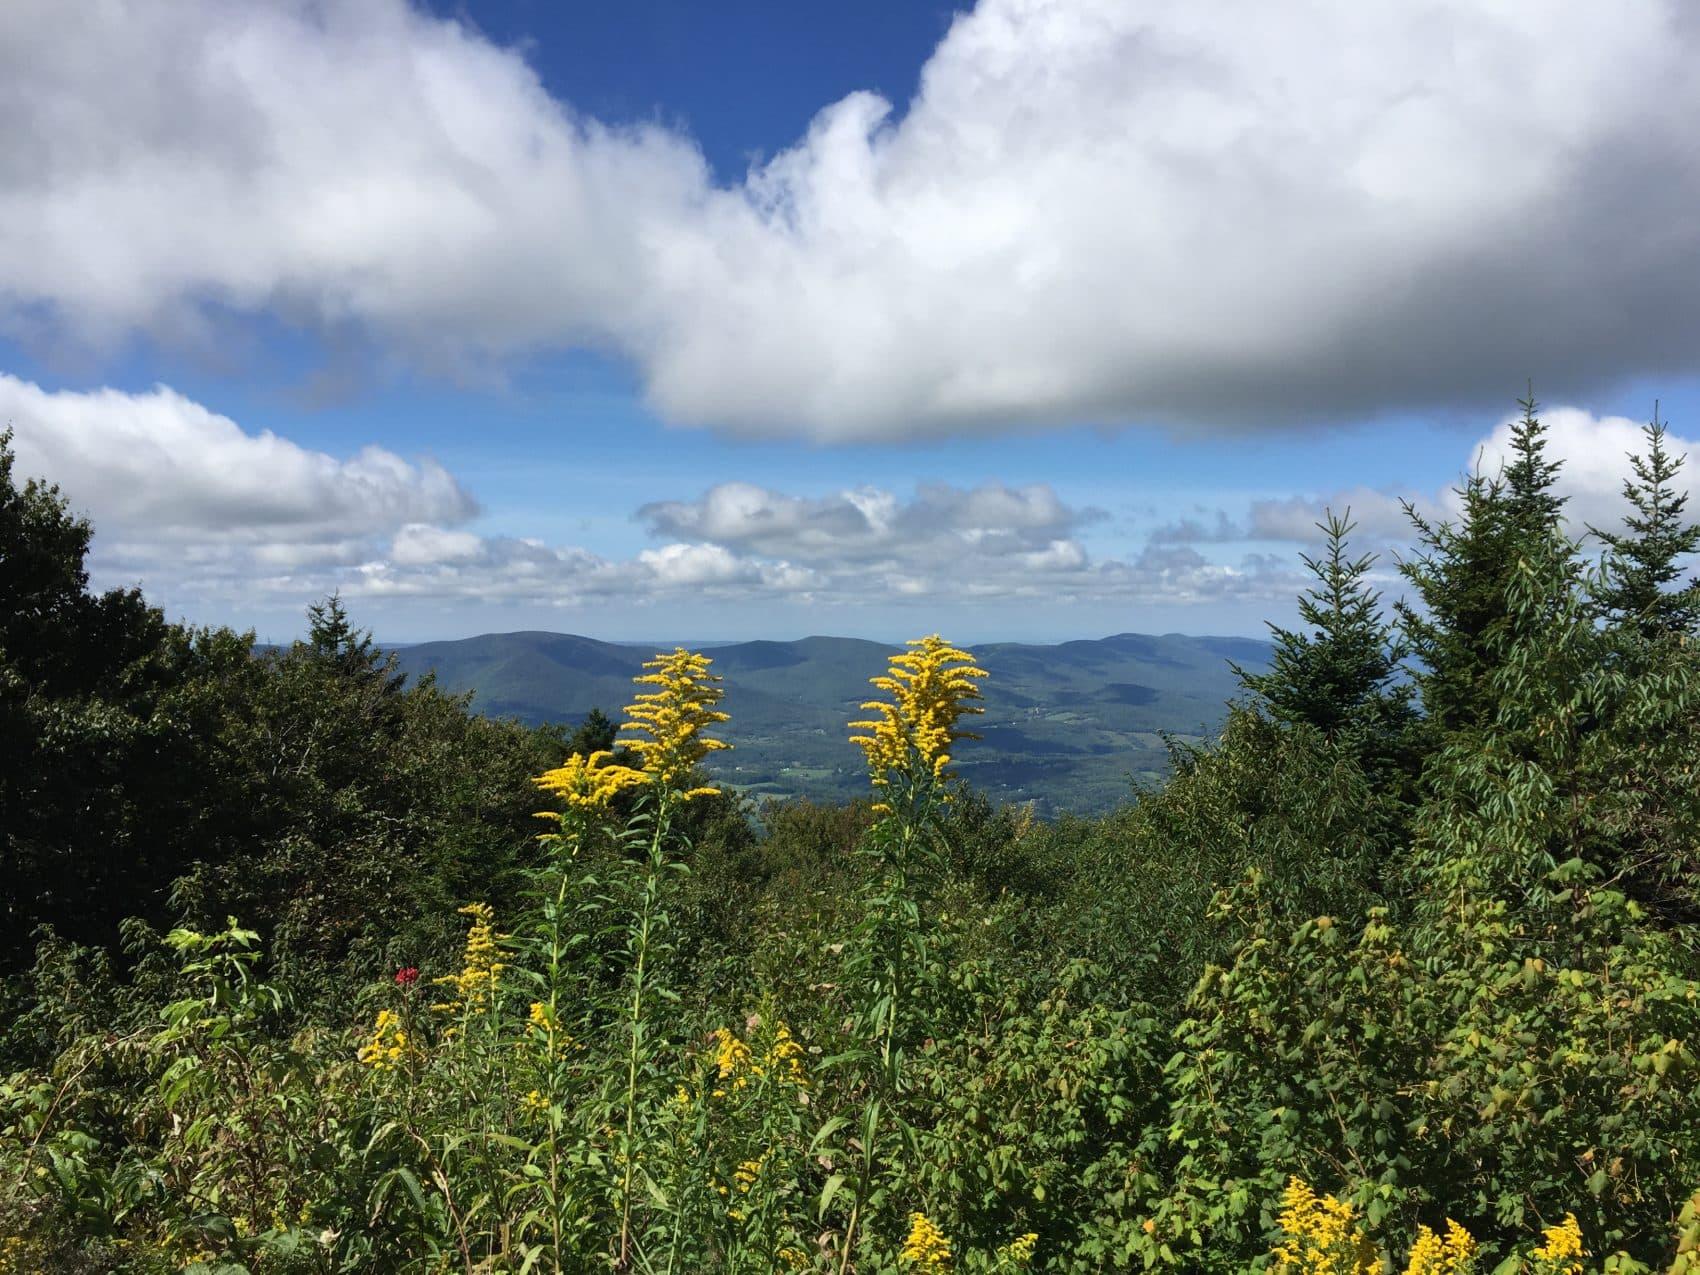 The view from Mount Greylock, the highest peak in the Berkshires. (Beth J. Harpaz/AP)